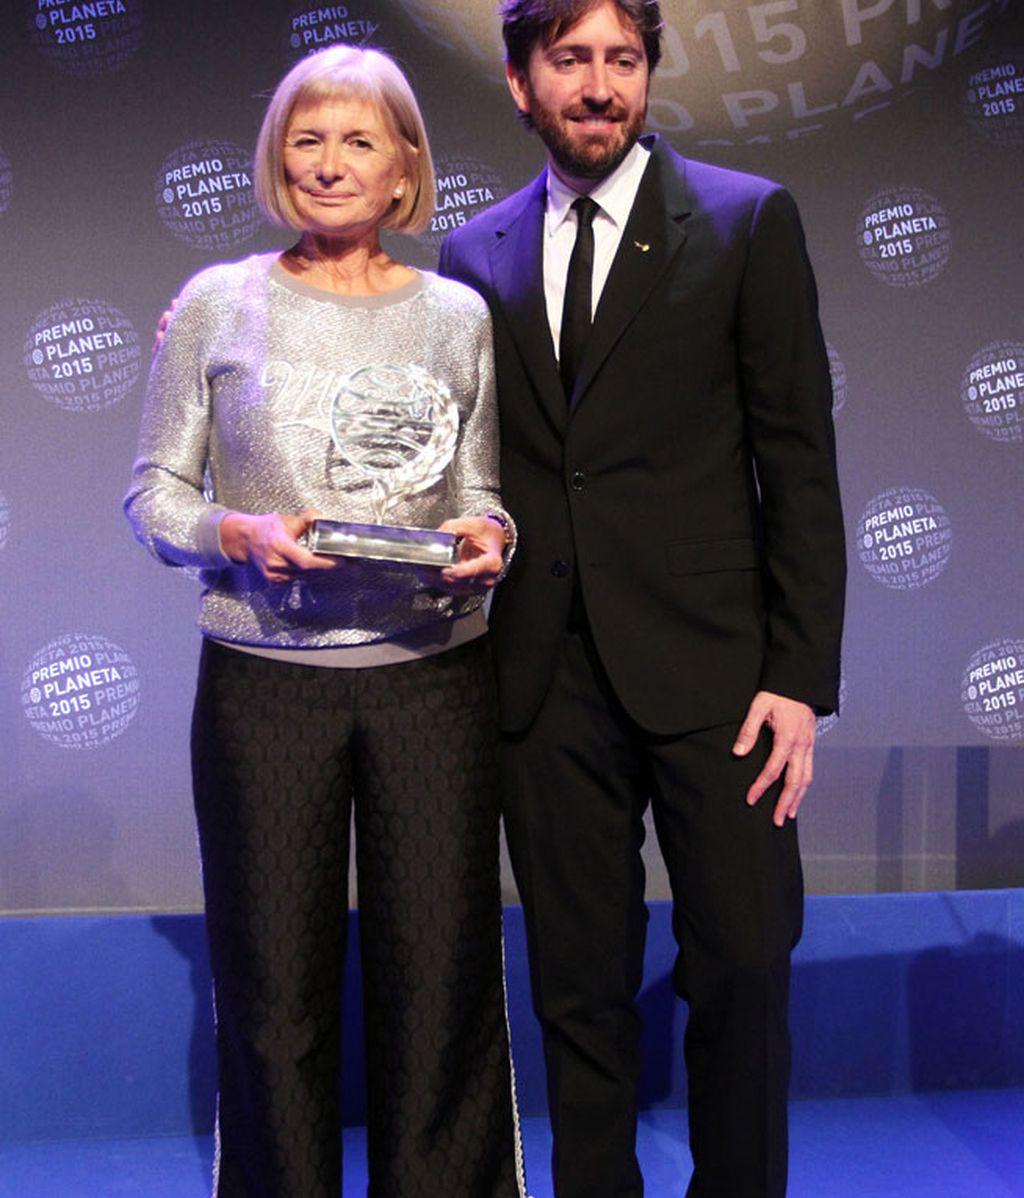 La ganadora, Alicia Giménez Barlett, junto a Daniel Sánchez Arévalo, finalista